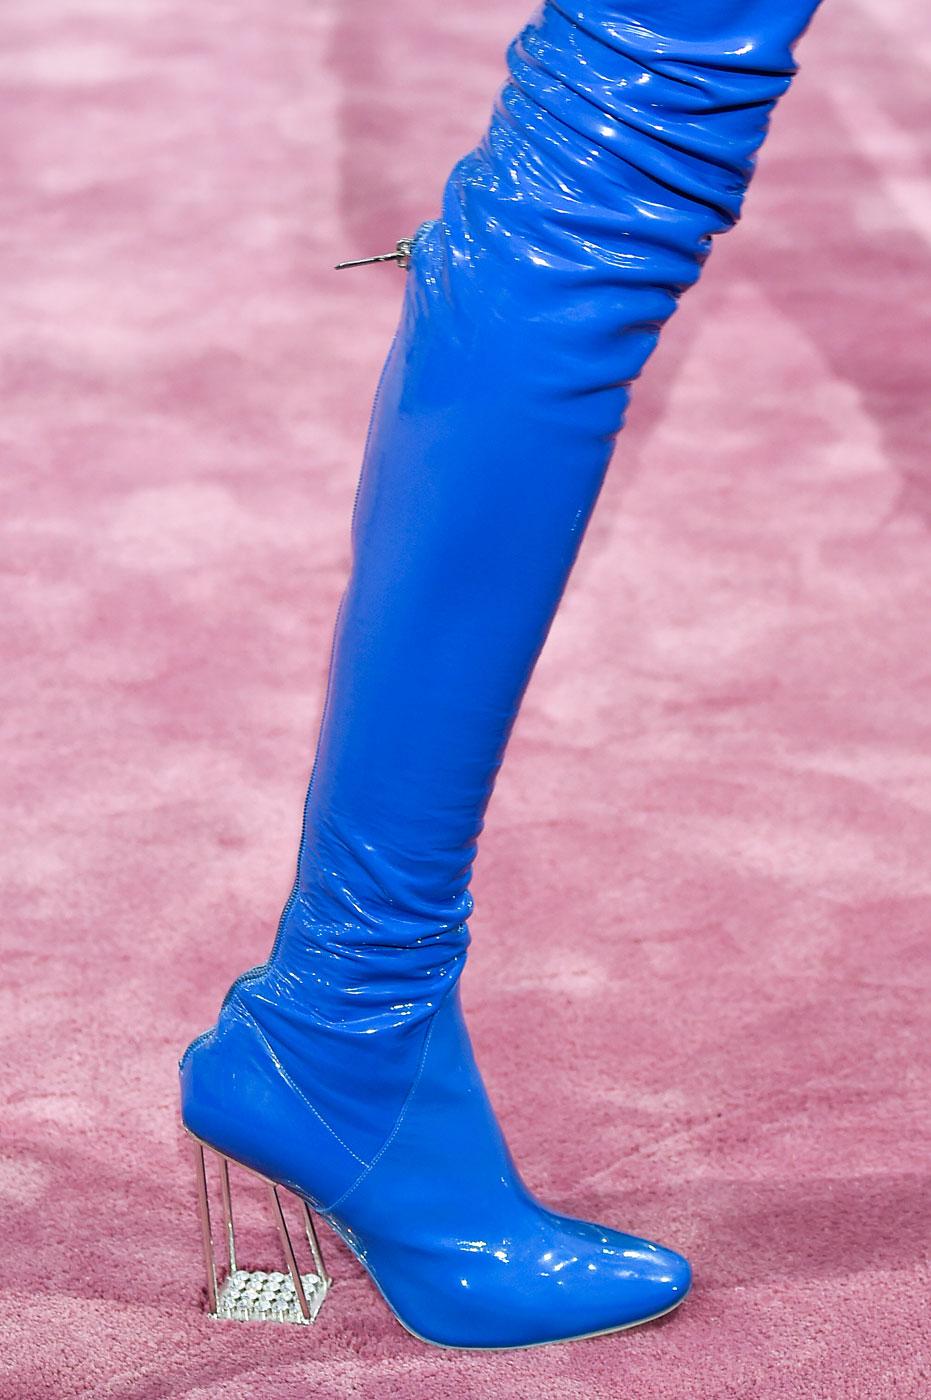 Christian-Dior-fashion-runway-show-close-ups-haute-couture-paris-spring-summer-2015-the-impression-098